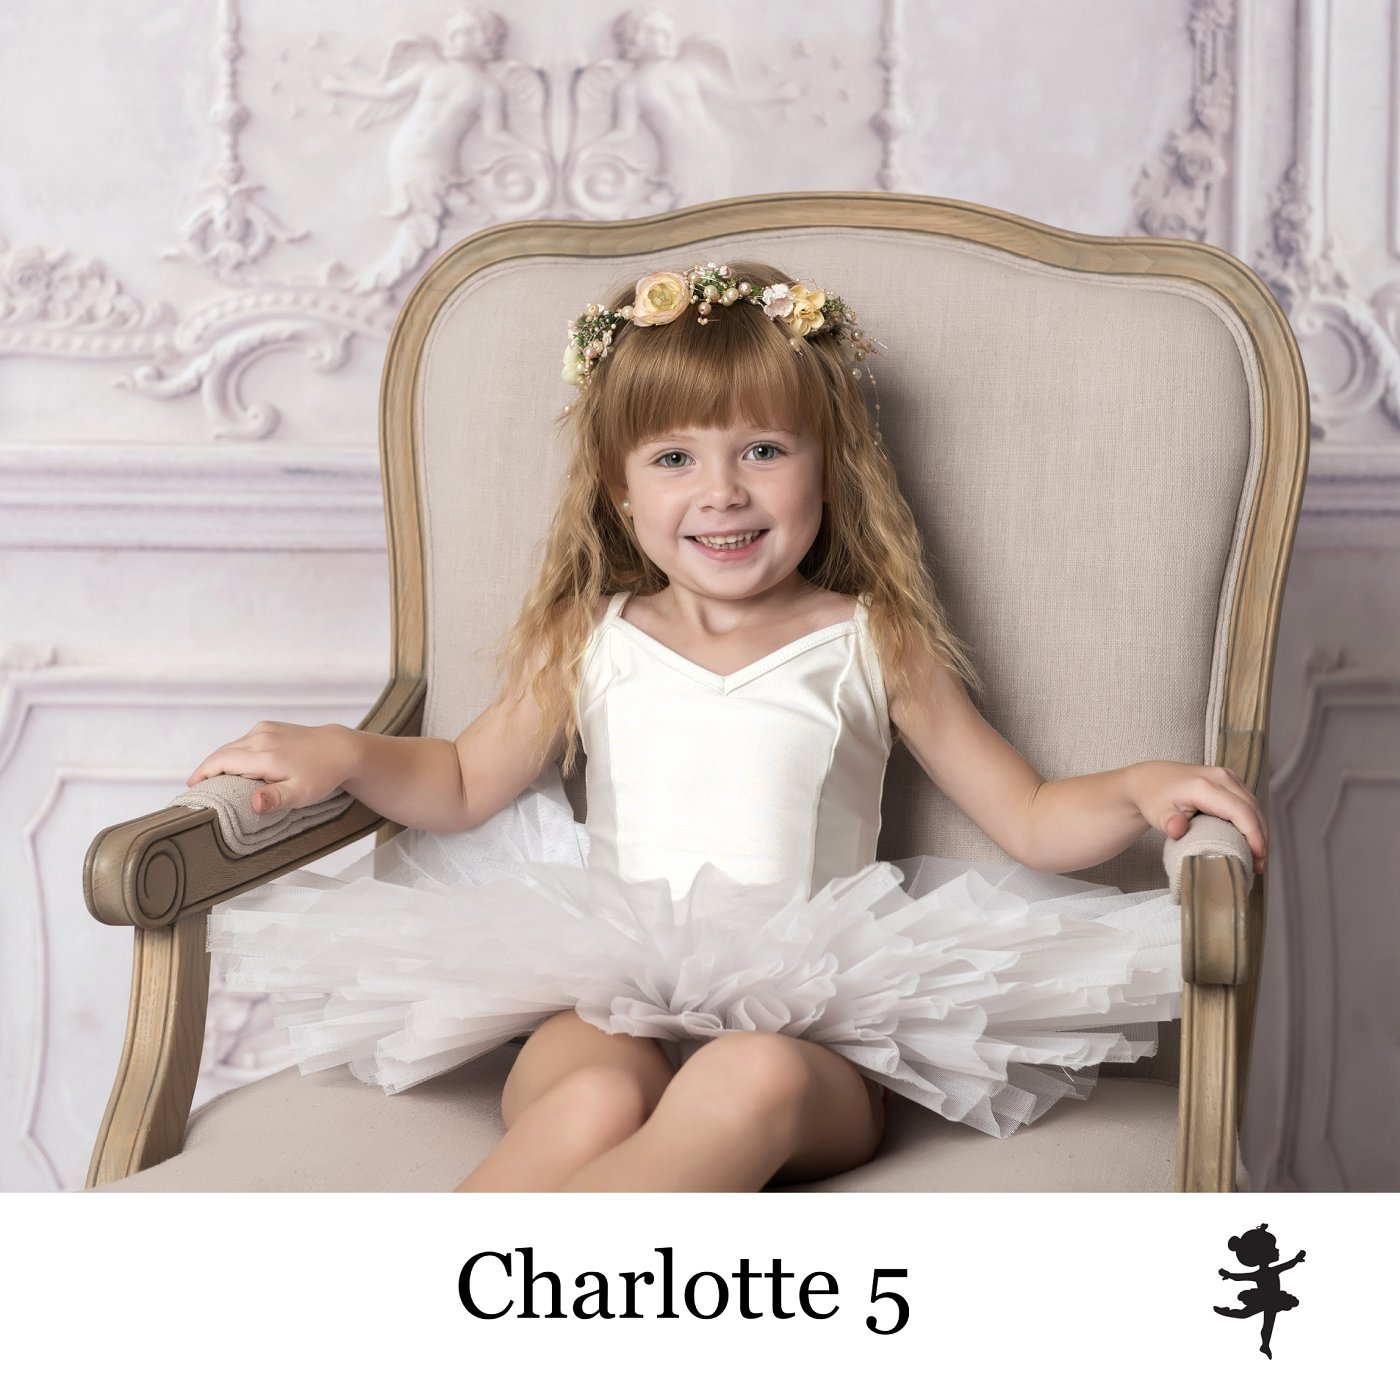 LB1619-Charlotte5.jpg